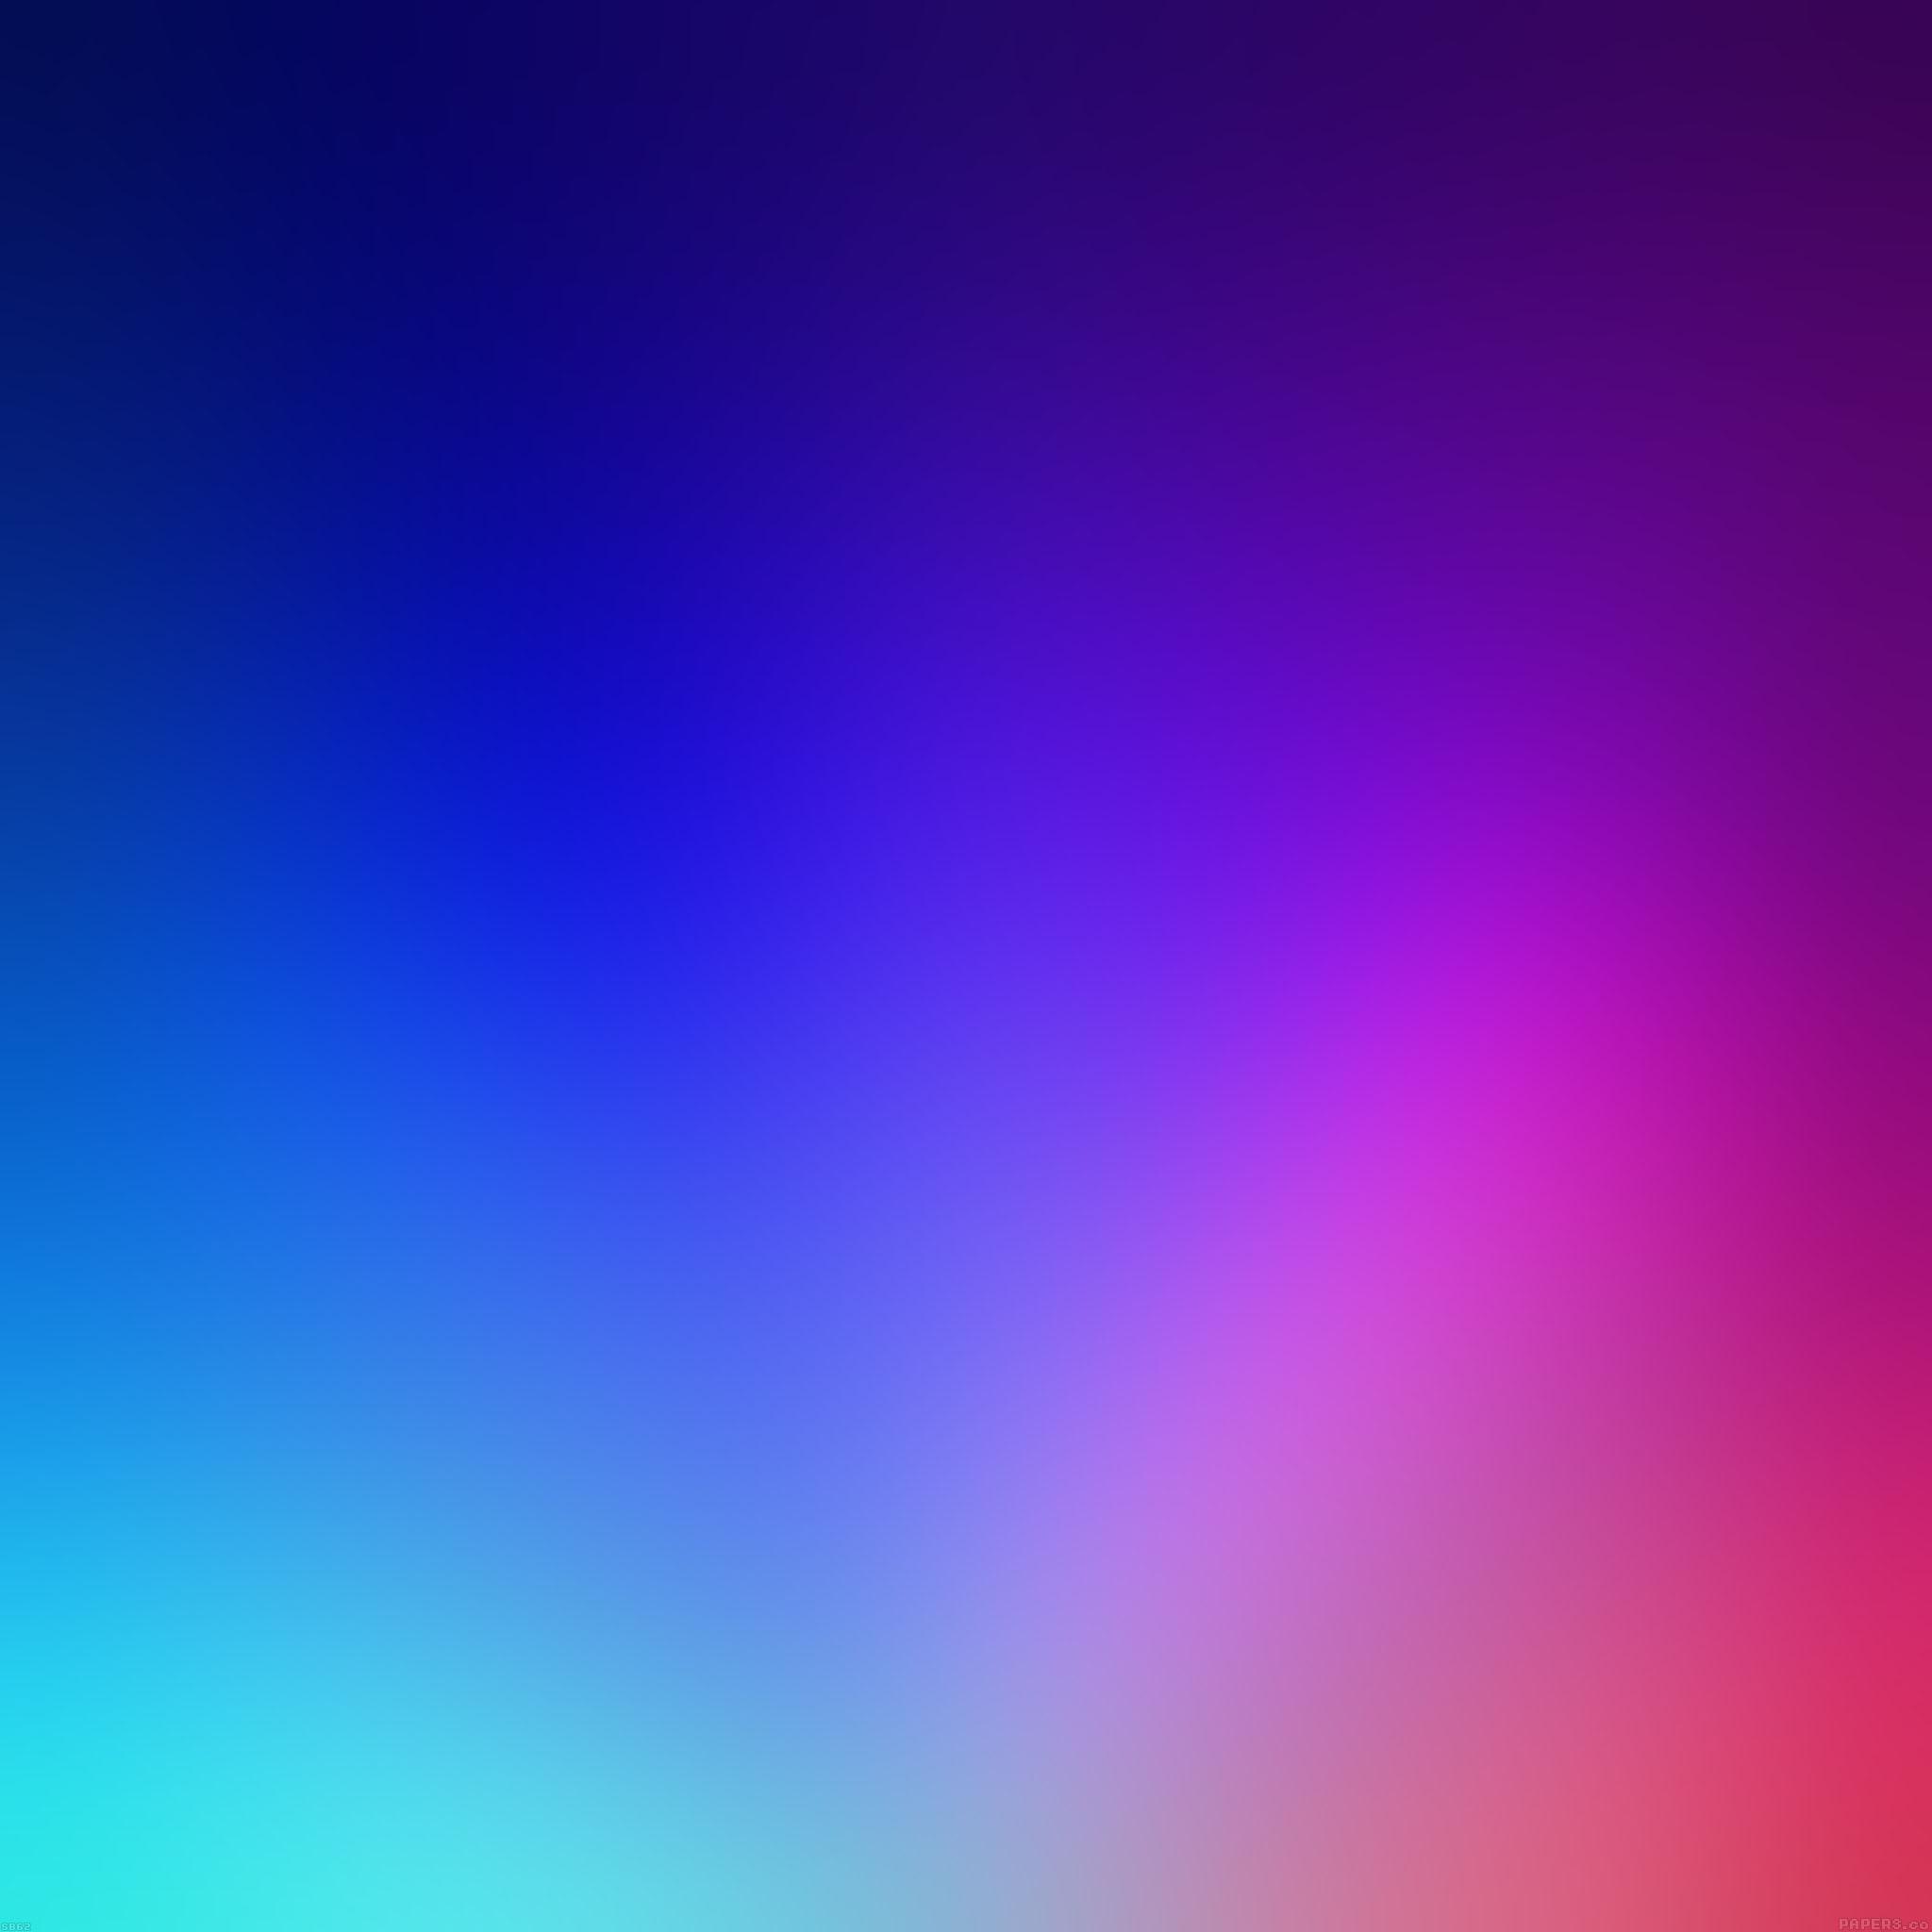 iphone 5 hd wallpaper retina